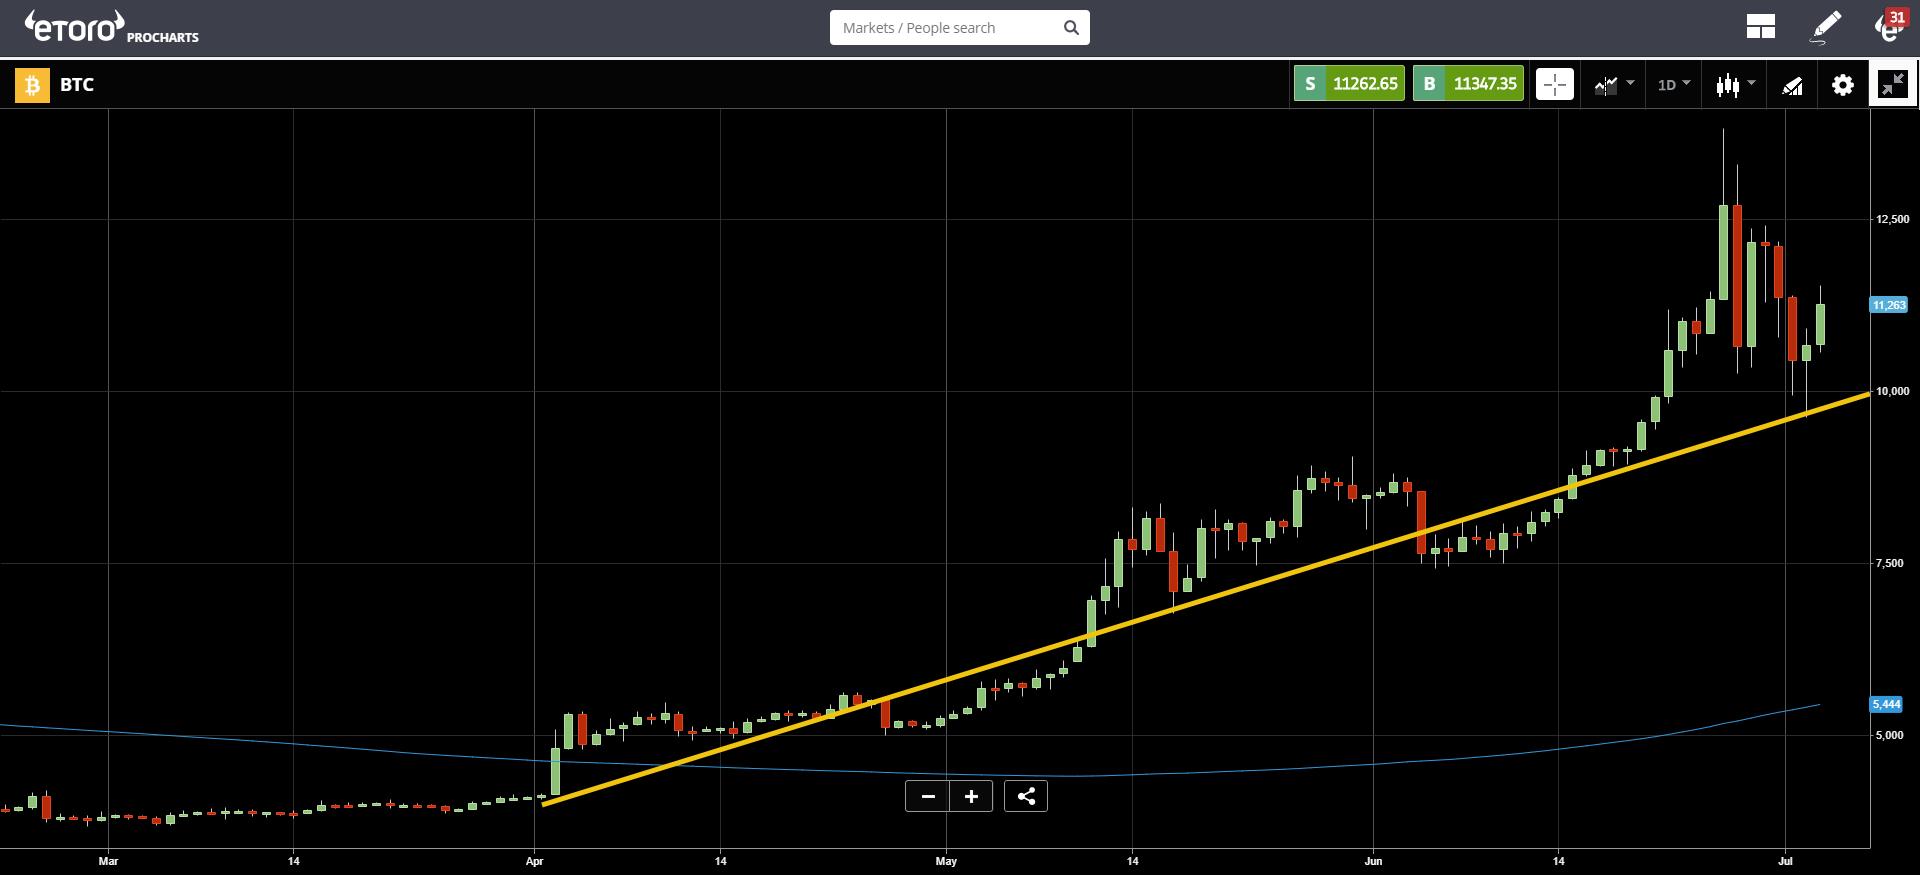 market, cryptocurrency, trading, bitcoin, blockchain, ethereum,